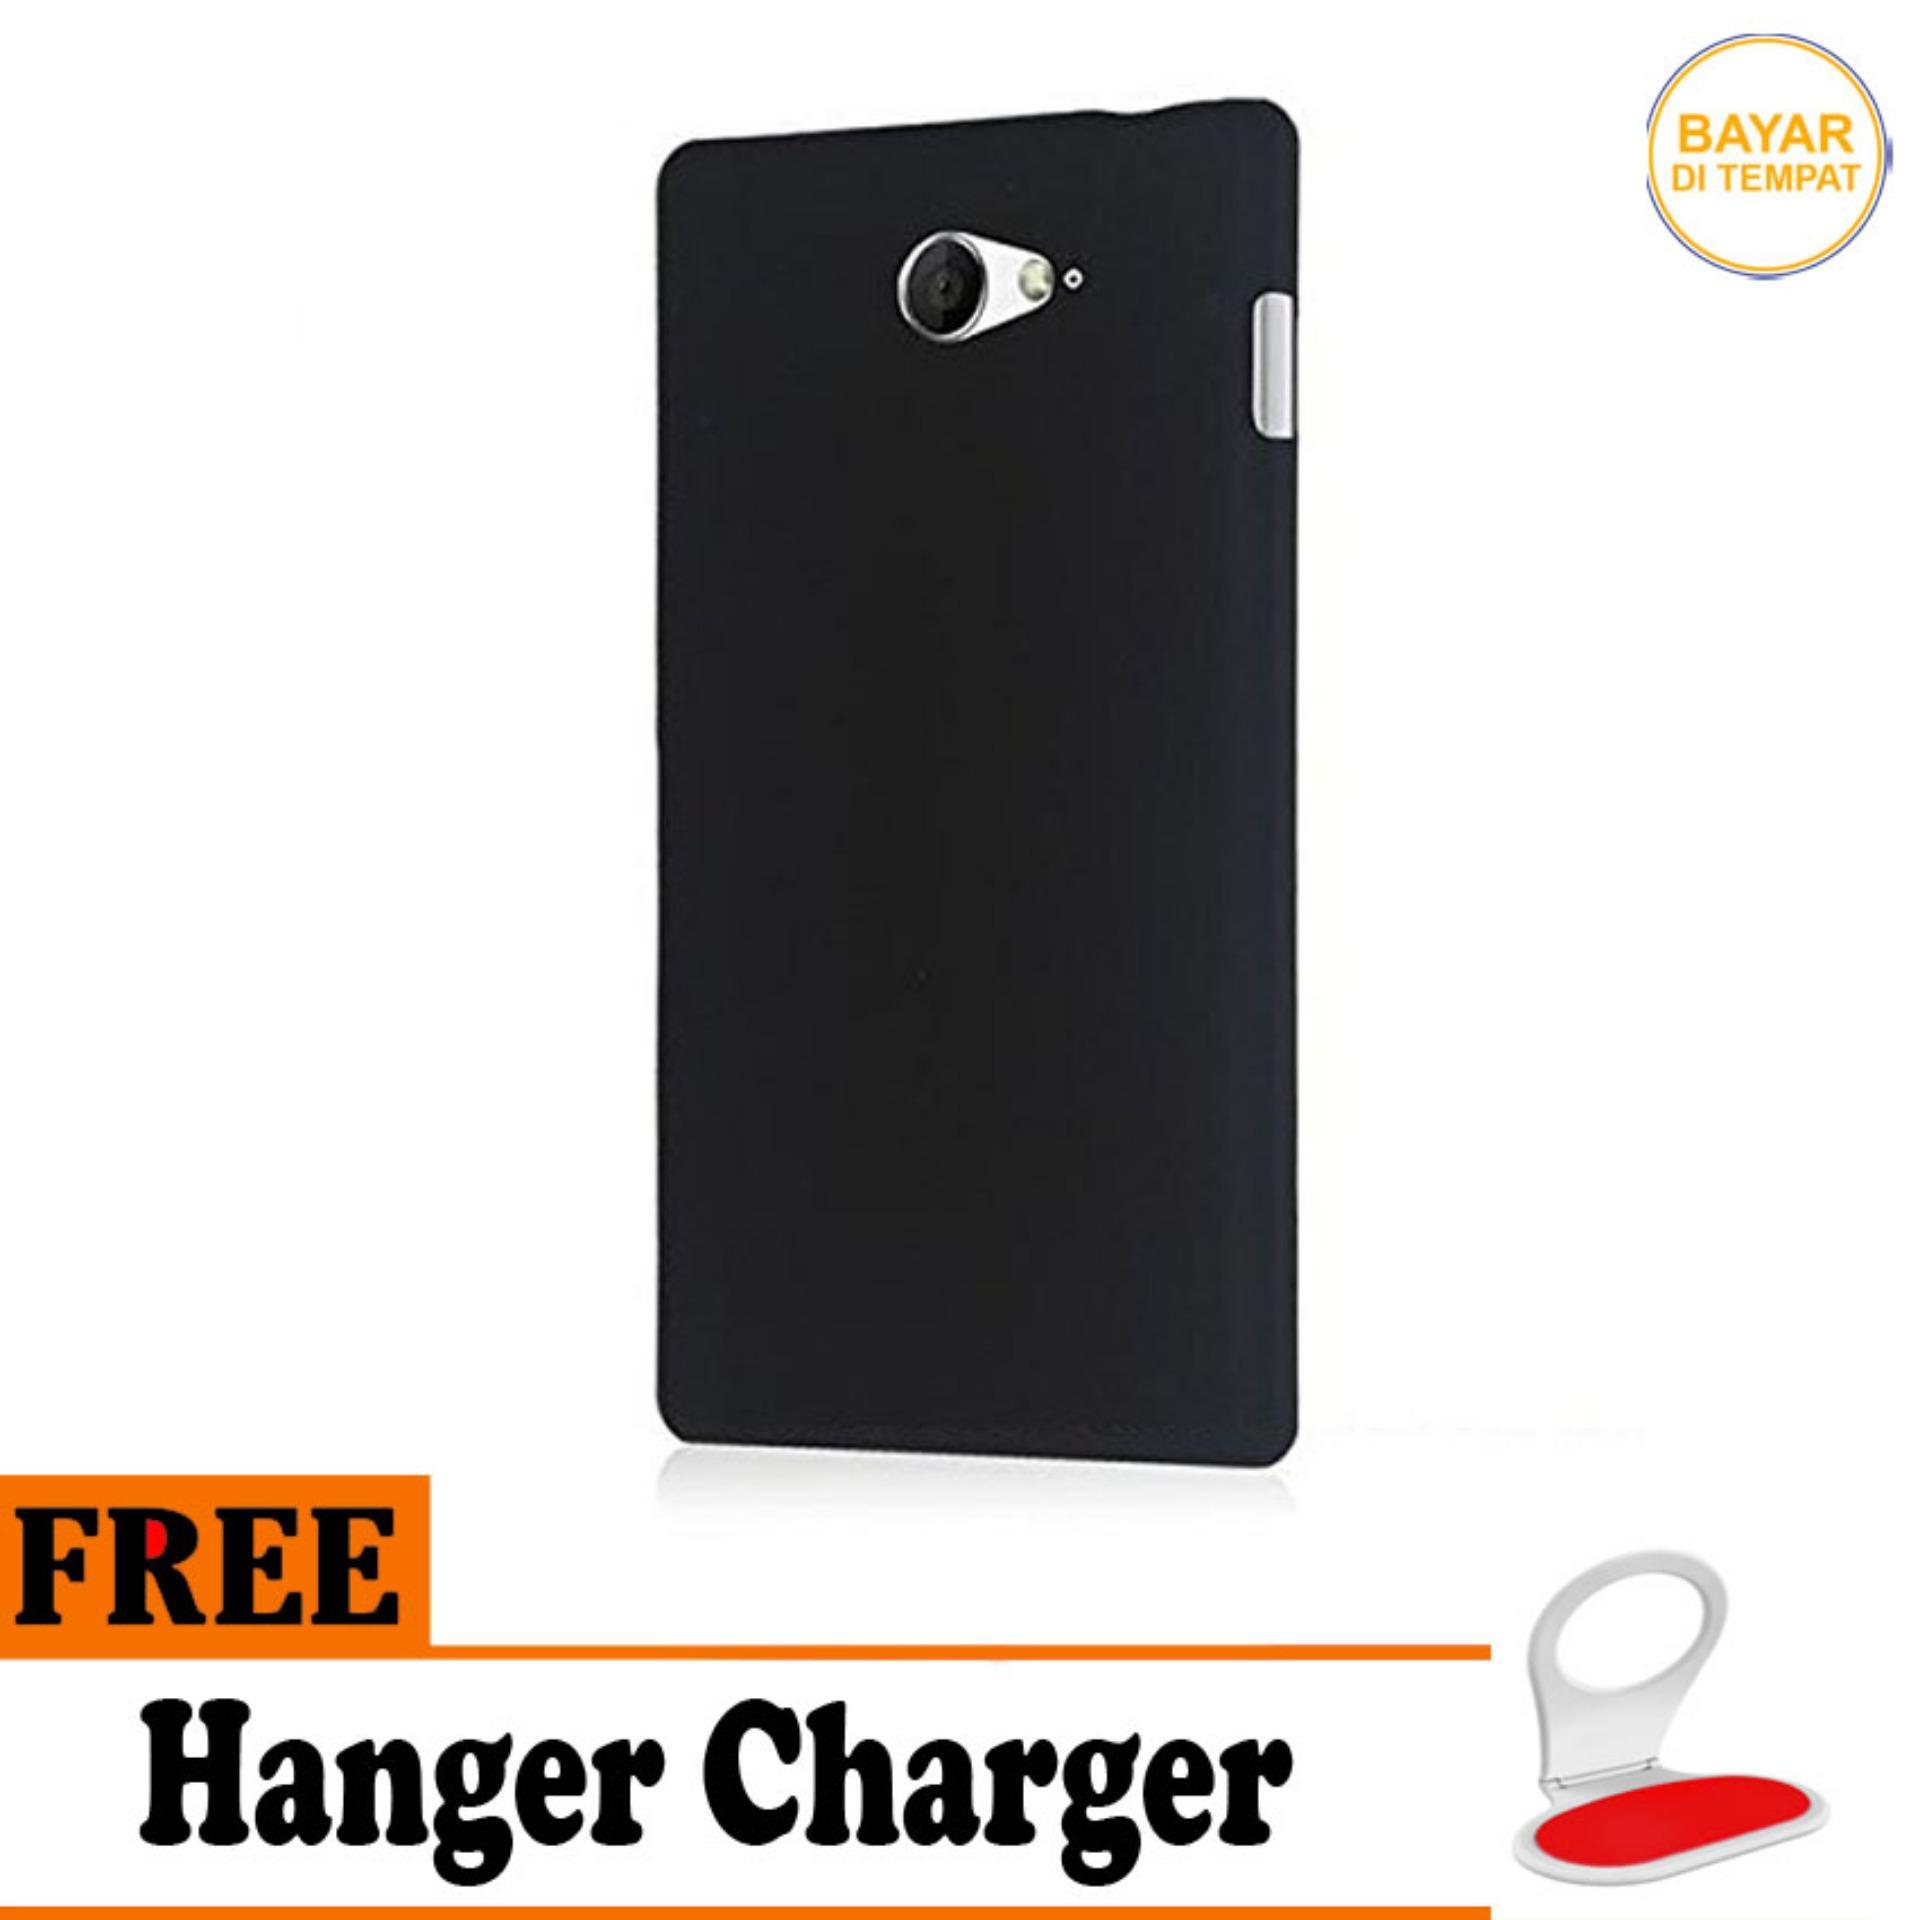 Case Matte Black Soft Slim Casing Handphone Sony Xperia M2 - Free Hanger Charger